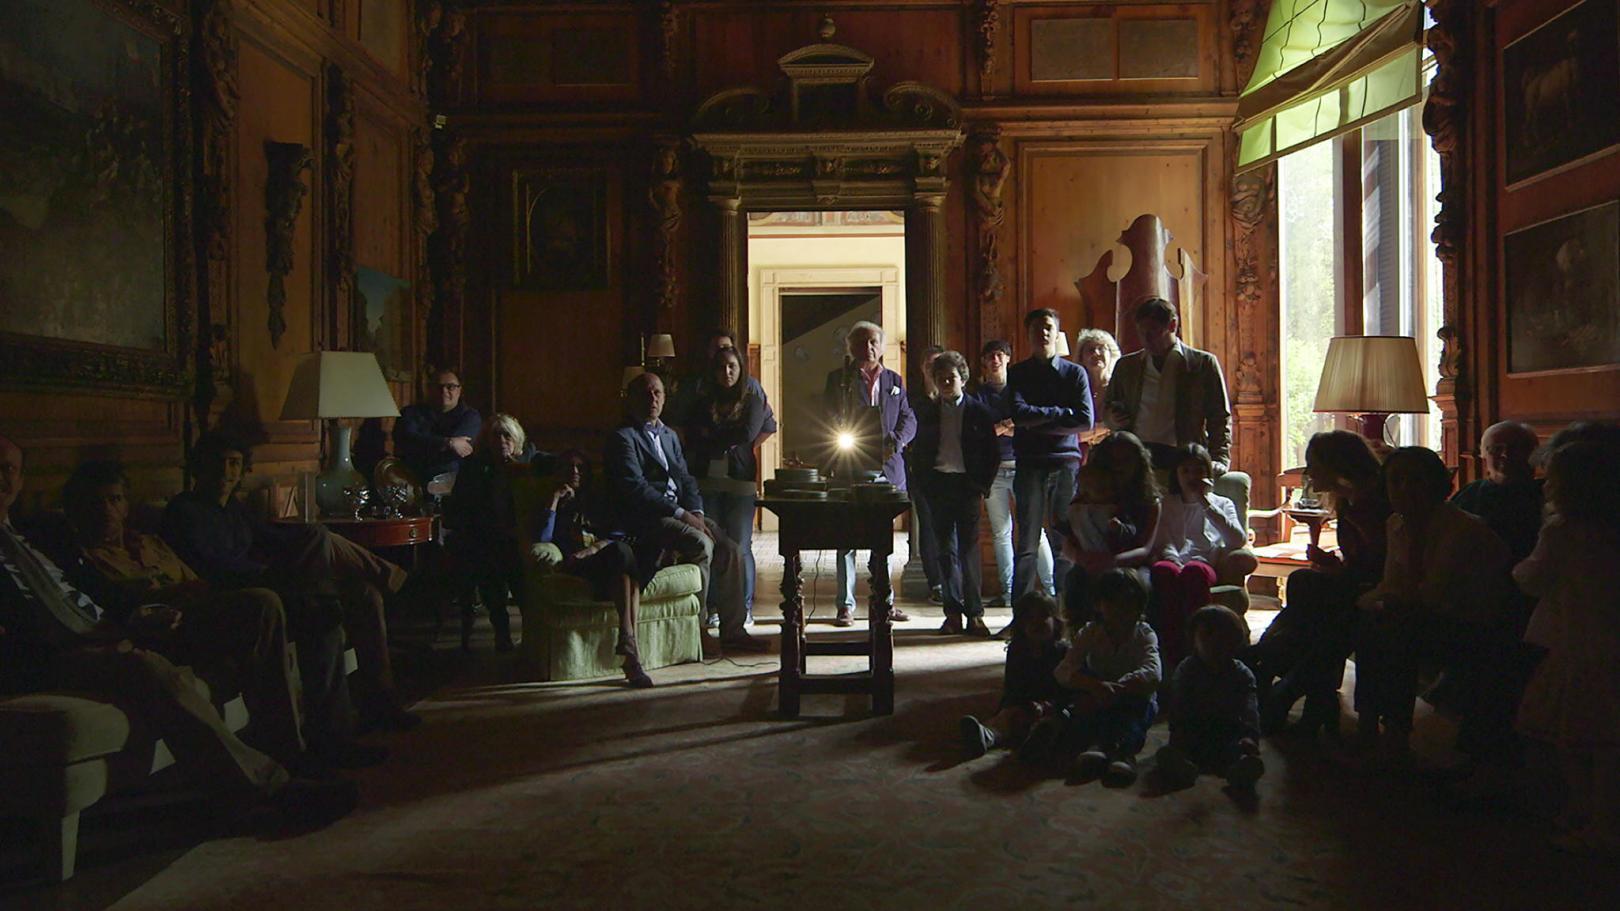 Films in London today: L'AMATORE at The Italian Cultural Institute (16 APR).